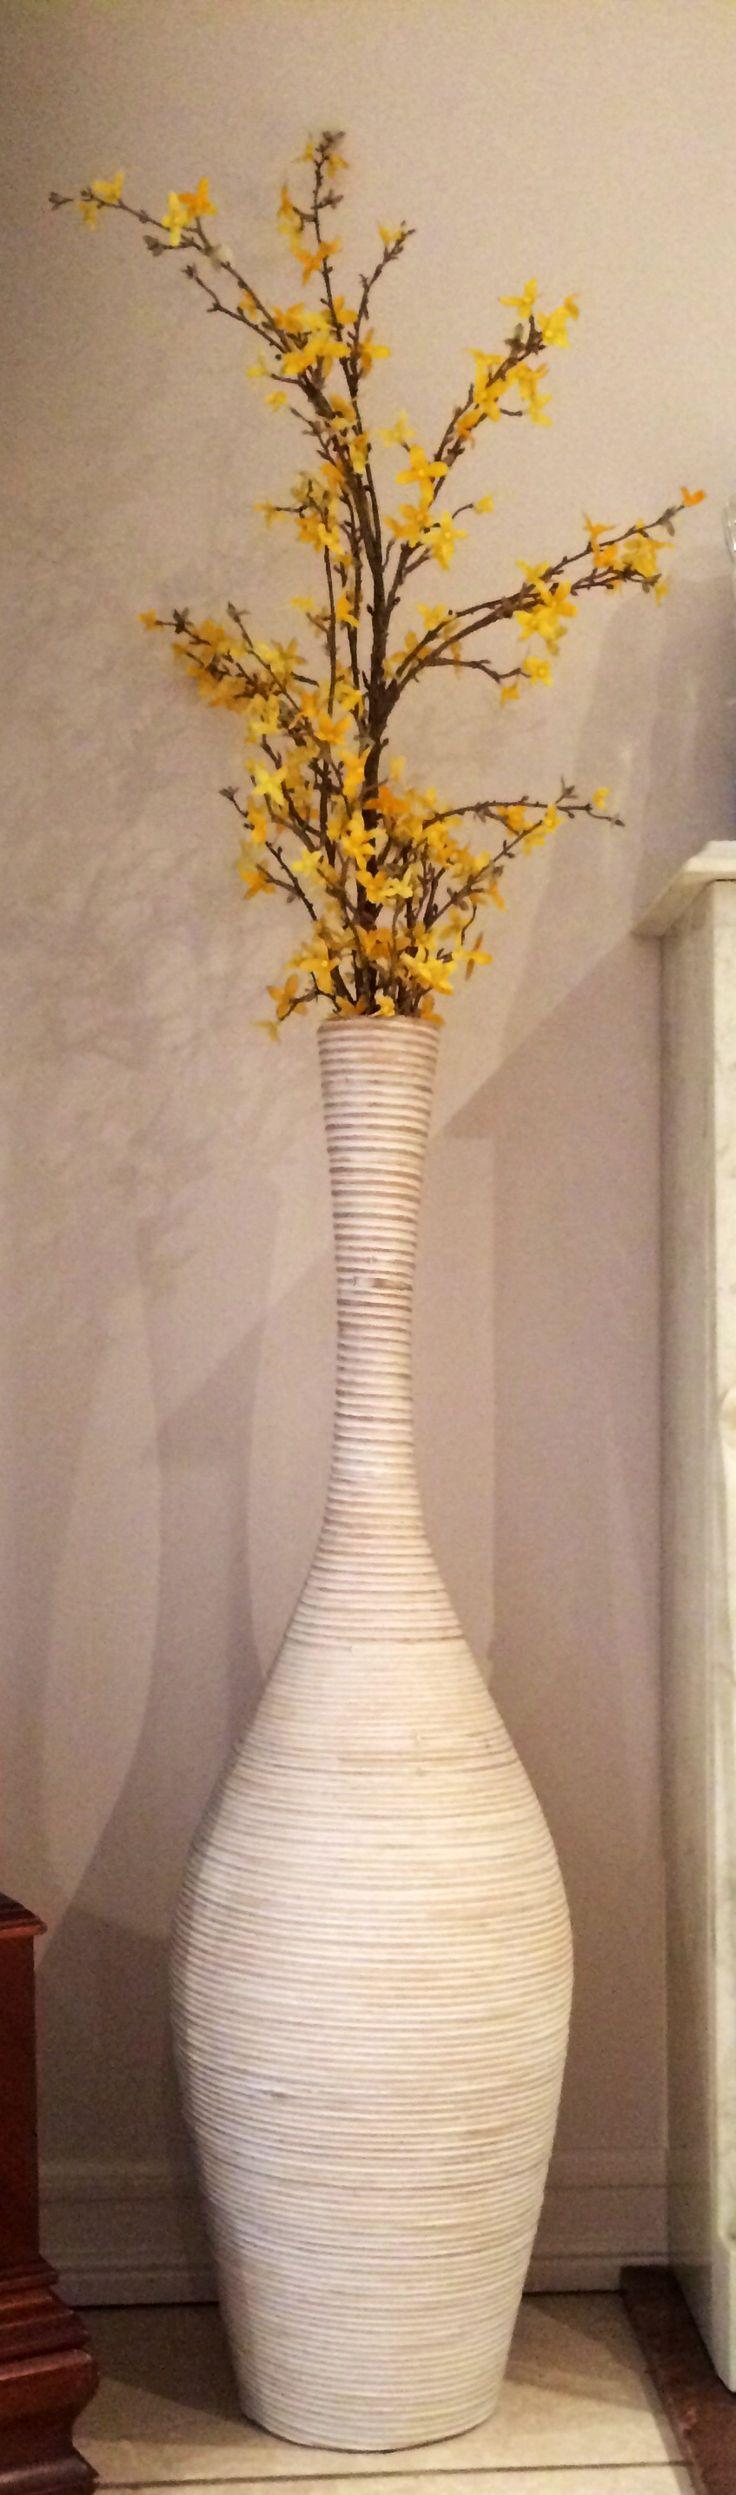 The 25 Best Floor Vases Ideas On Pinterest Decorating